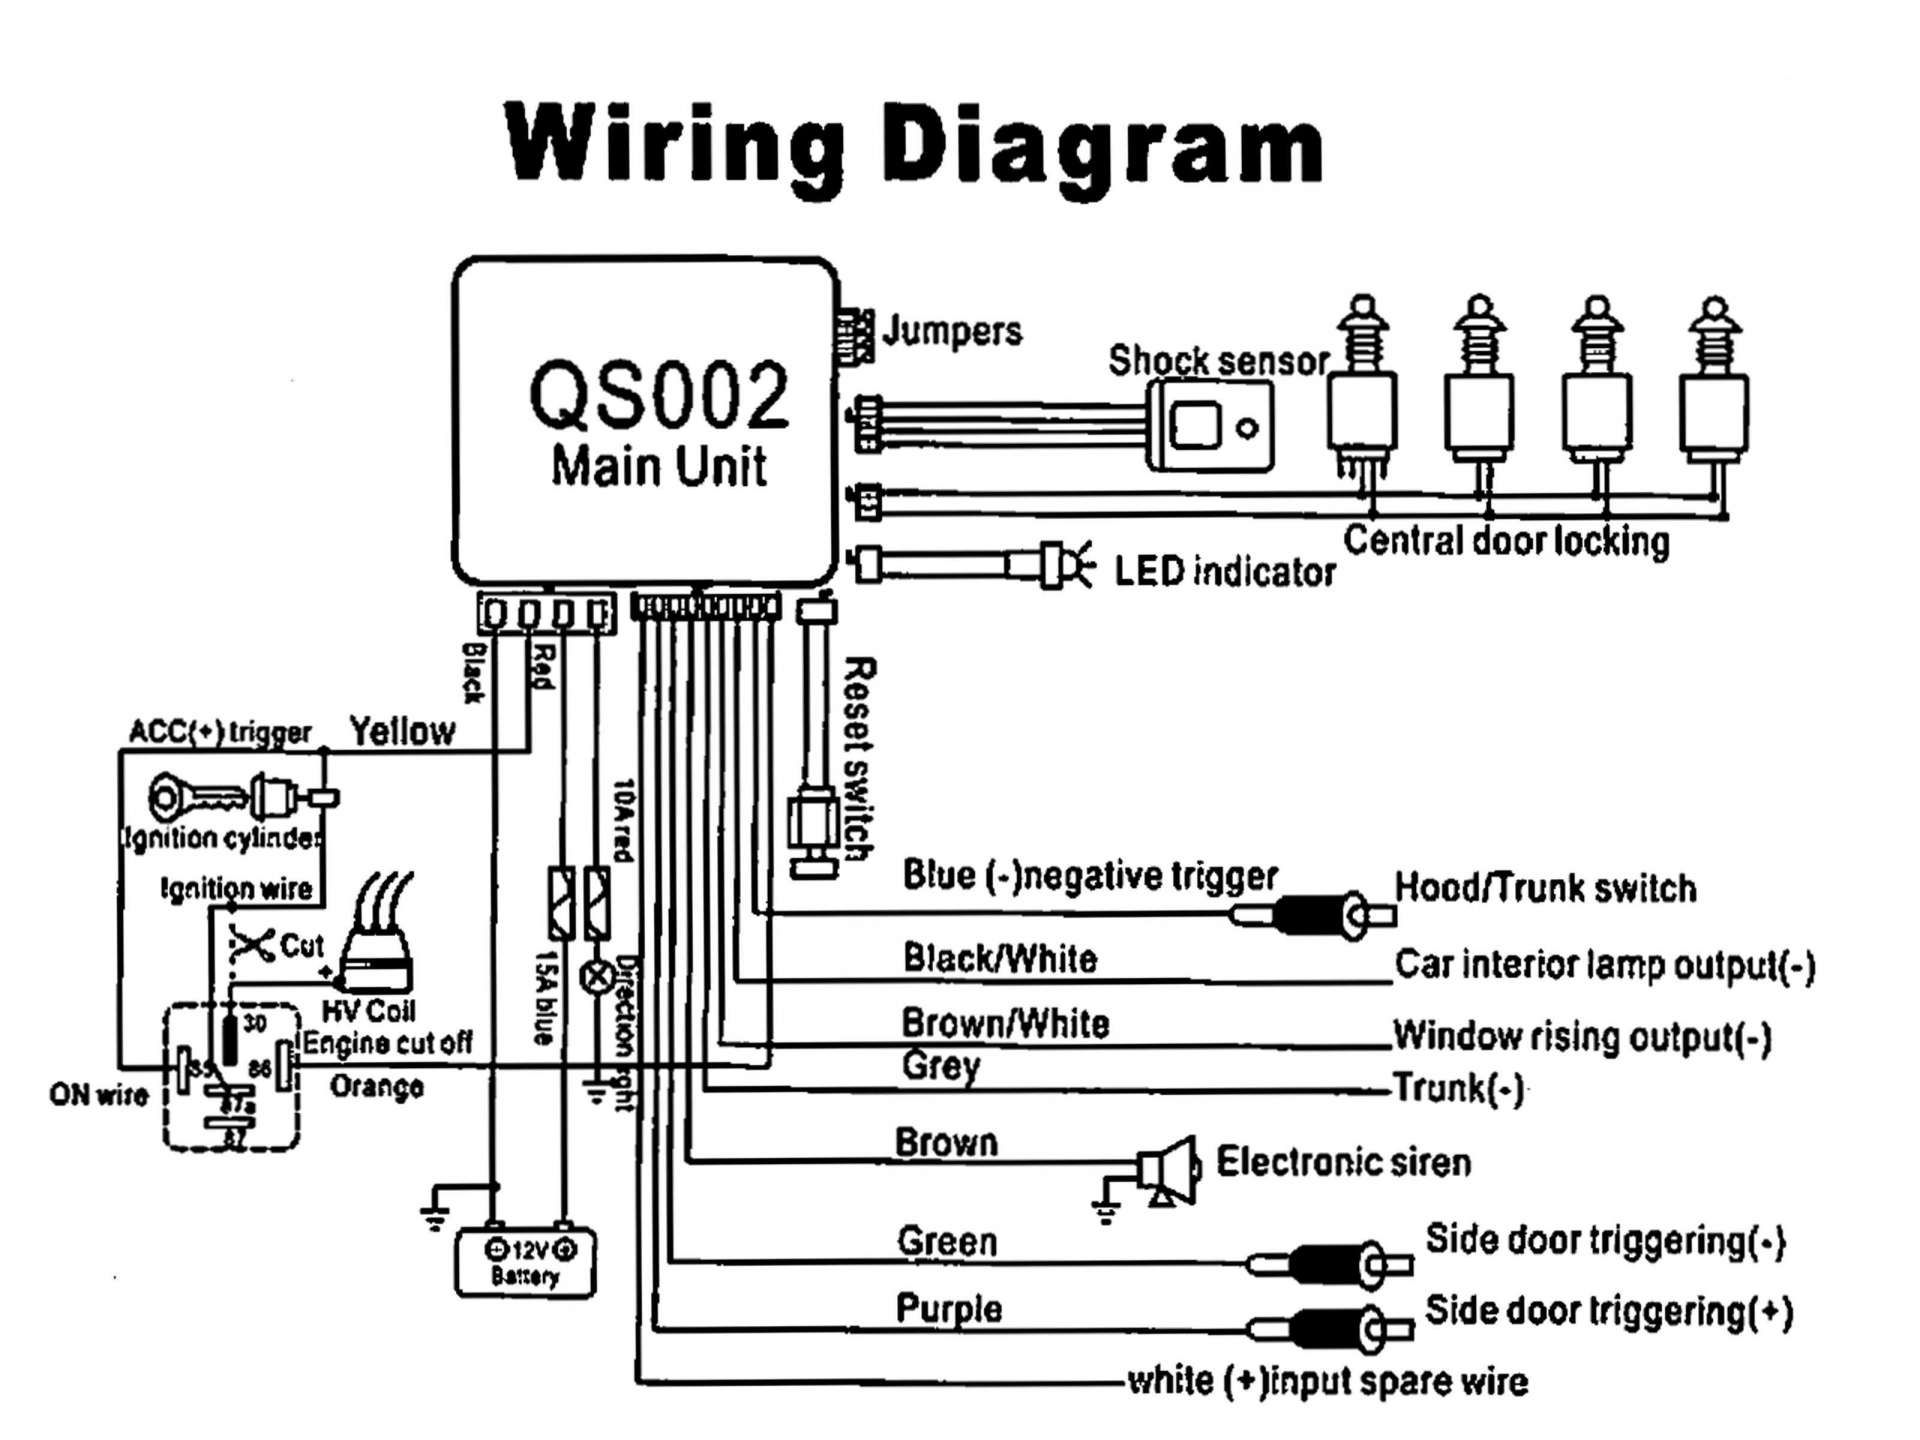 17 avs car alarm wiring diagram  car diagram  wiringg